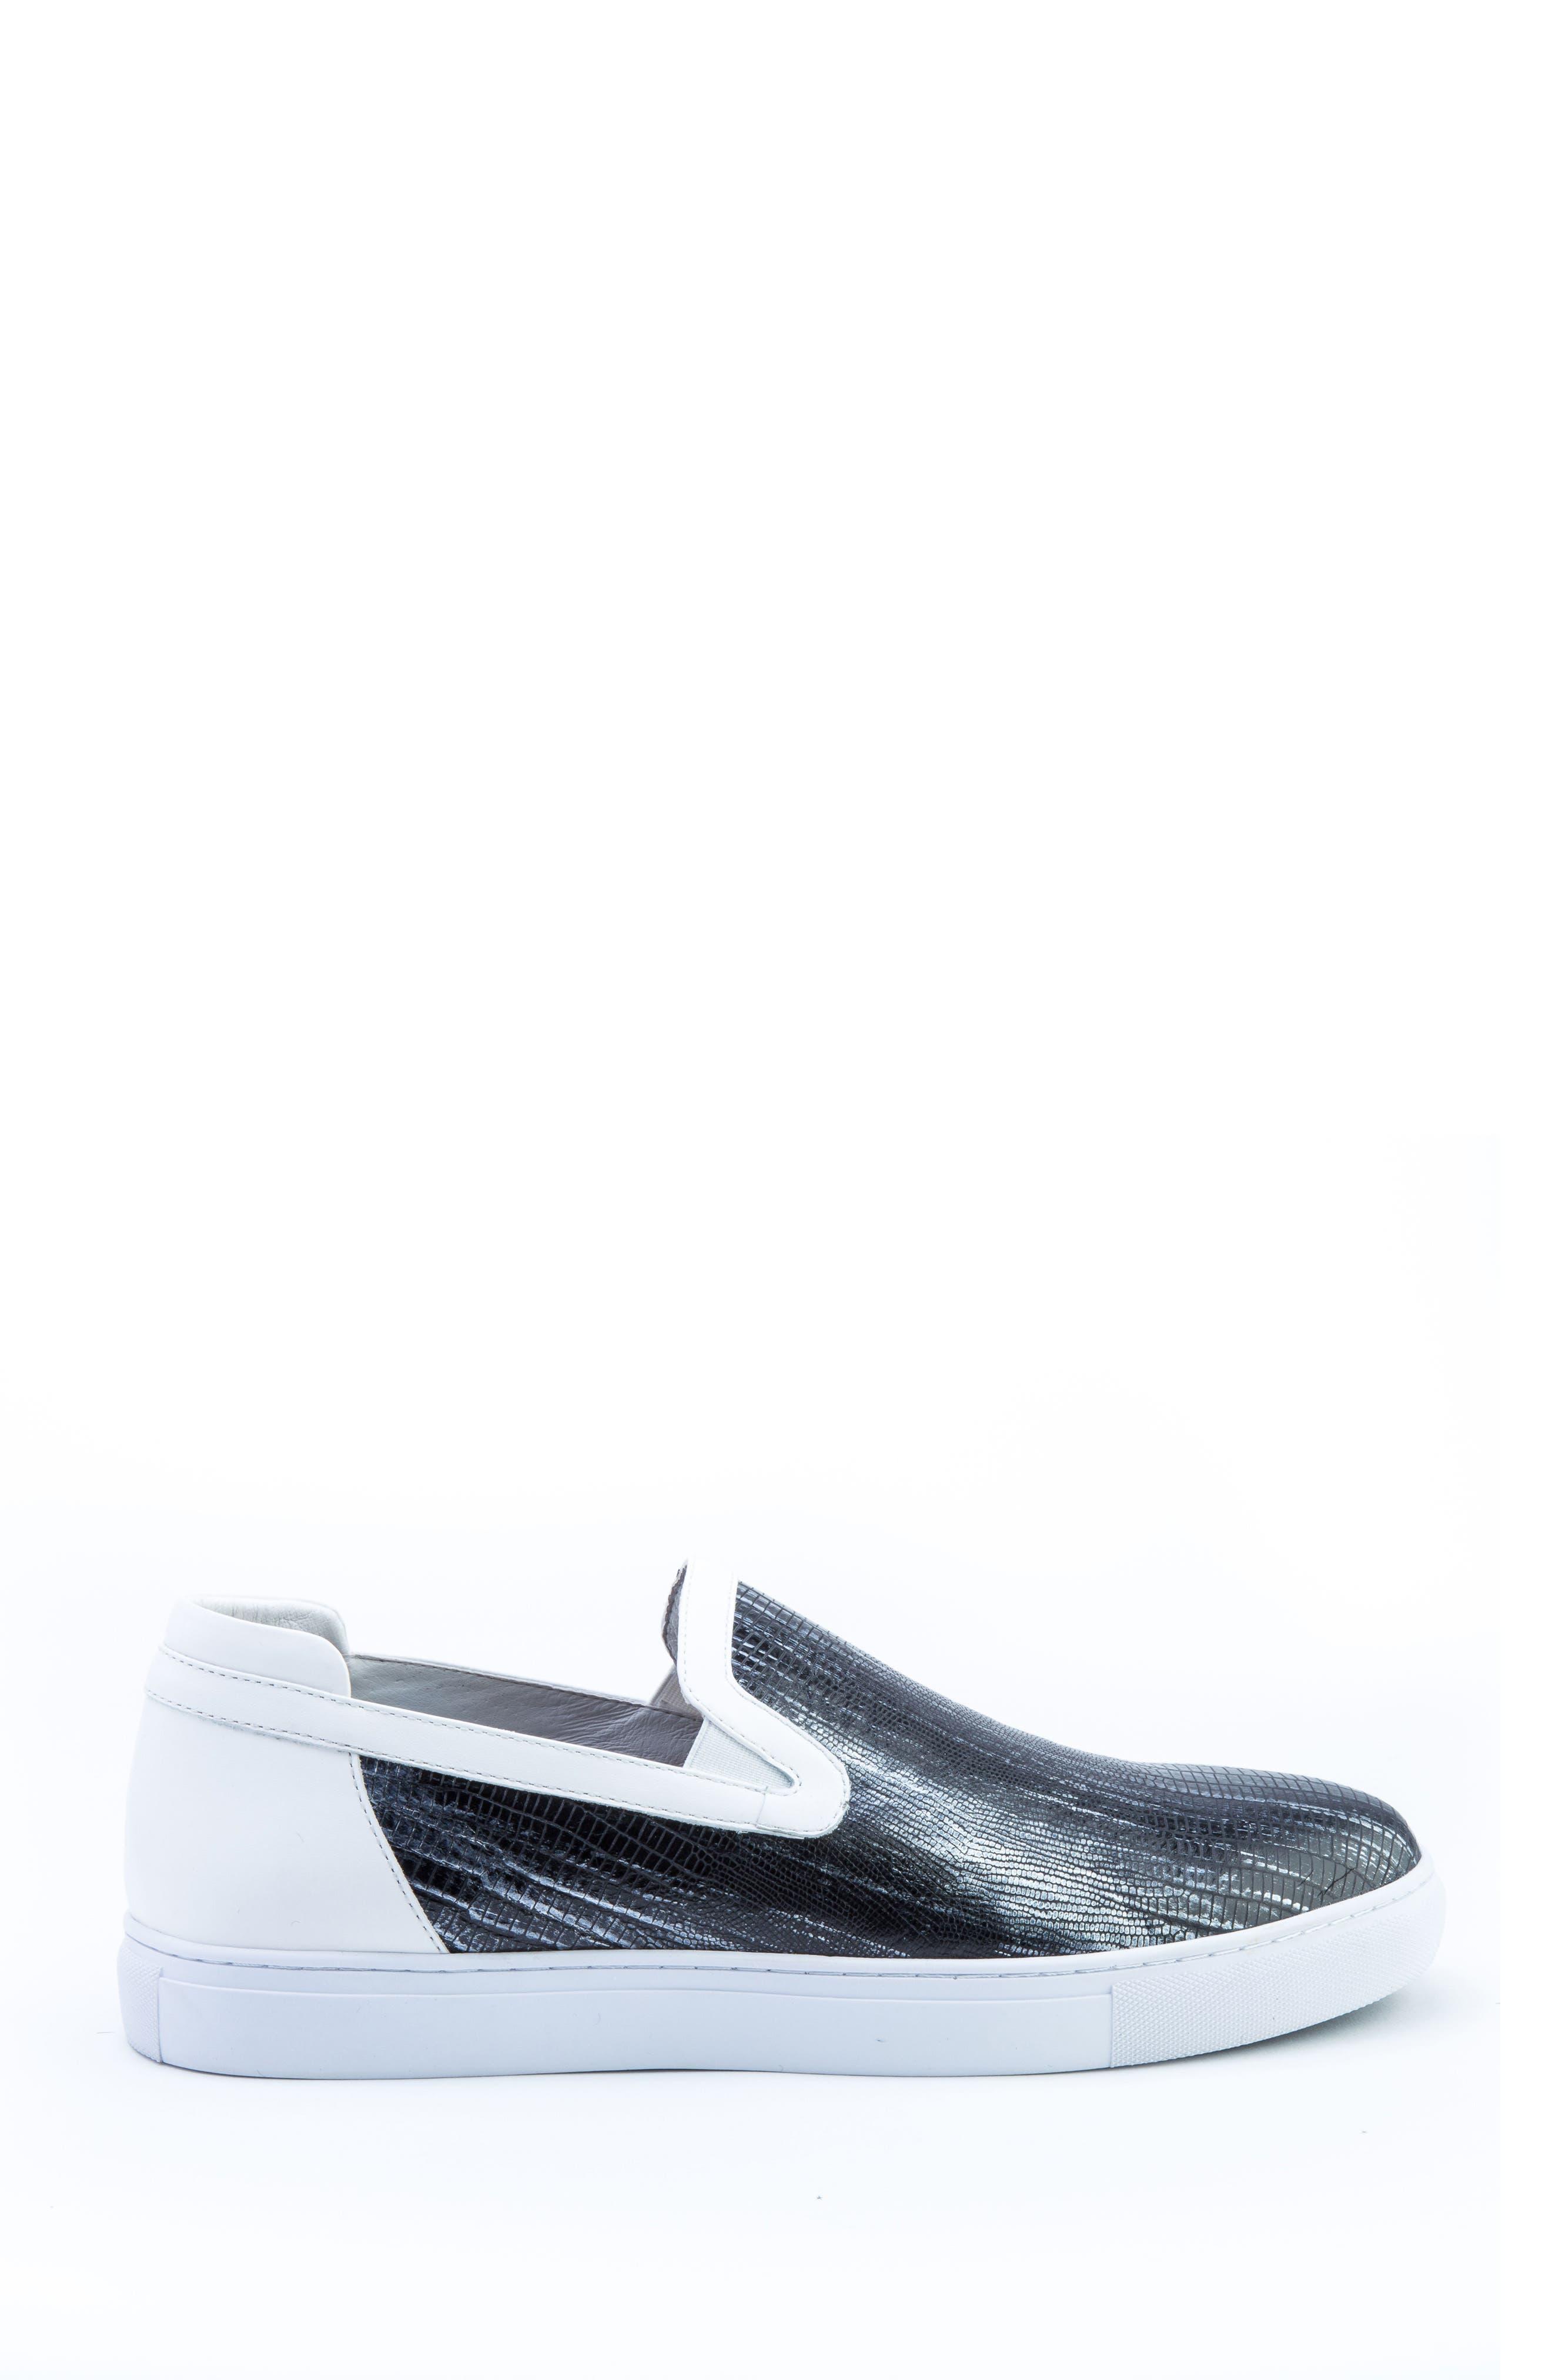 Alternate Image 3  - Badgley Mischka Bogart Sneaker (Men)